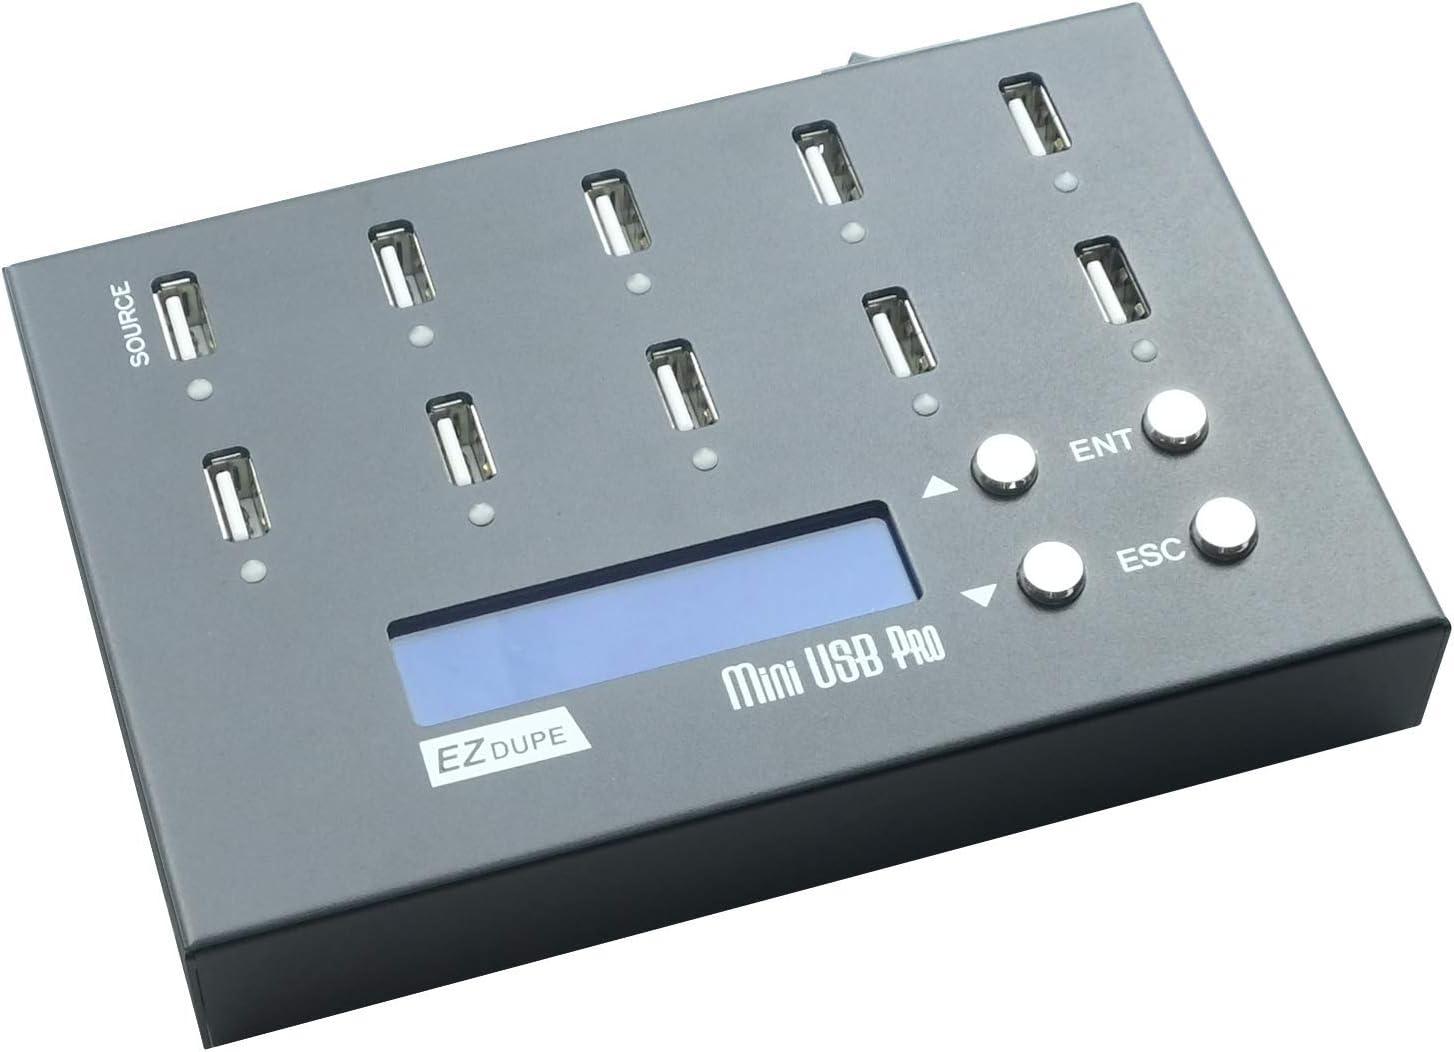 EZ DUPE 1 to 9 Mini USB Pro Duplicator Standalone USB Flash Drive and USB Hard Drive Duplicator Copier Eraser (DM-FU0-10V09B)